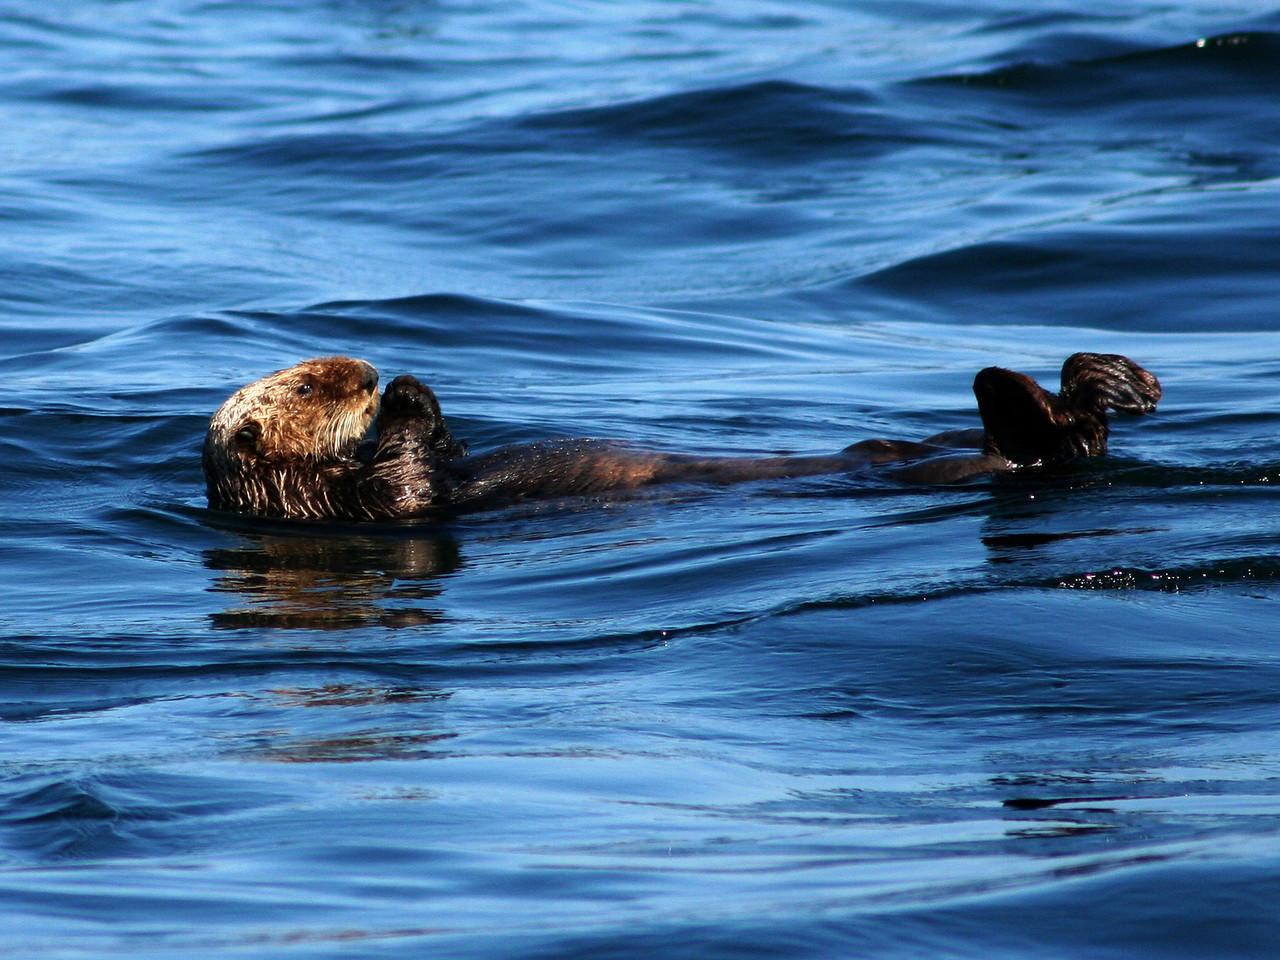 Sea Otter feeding - Chatham Strait off the west coast of Kuiu Island.